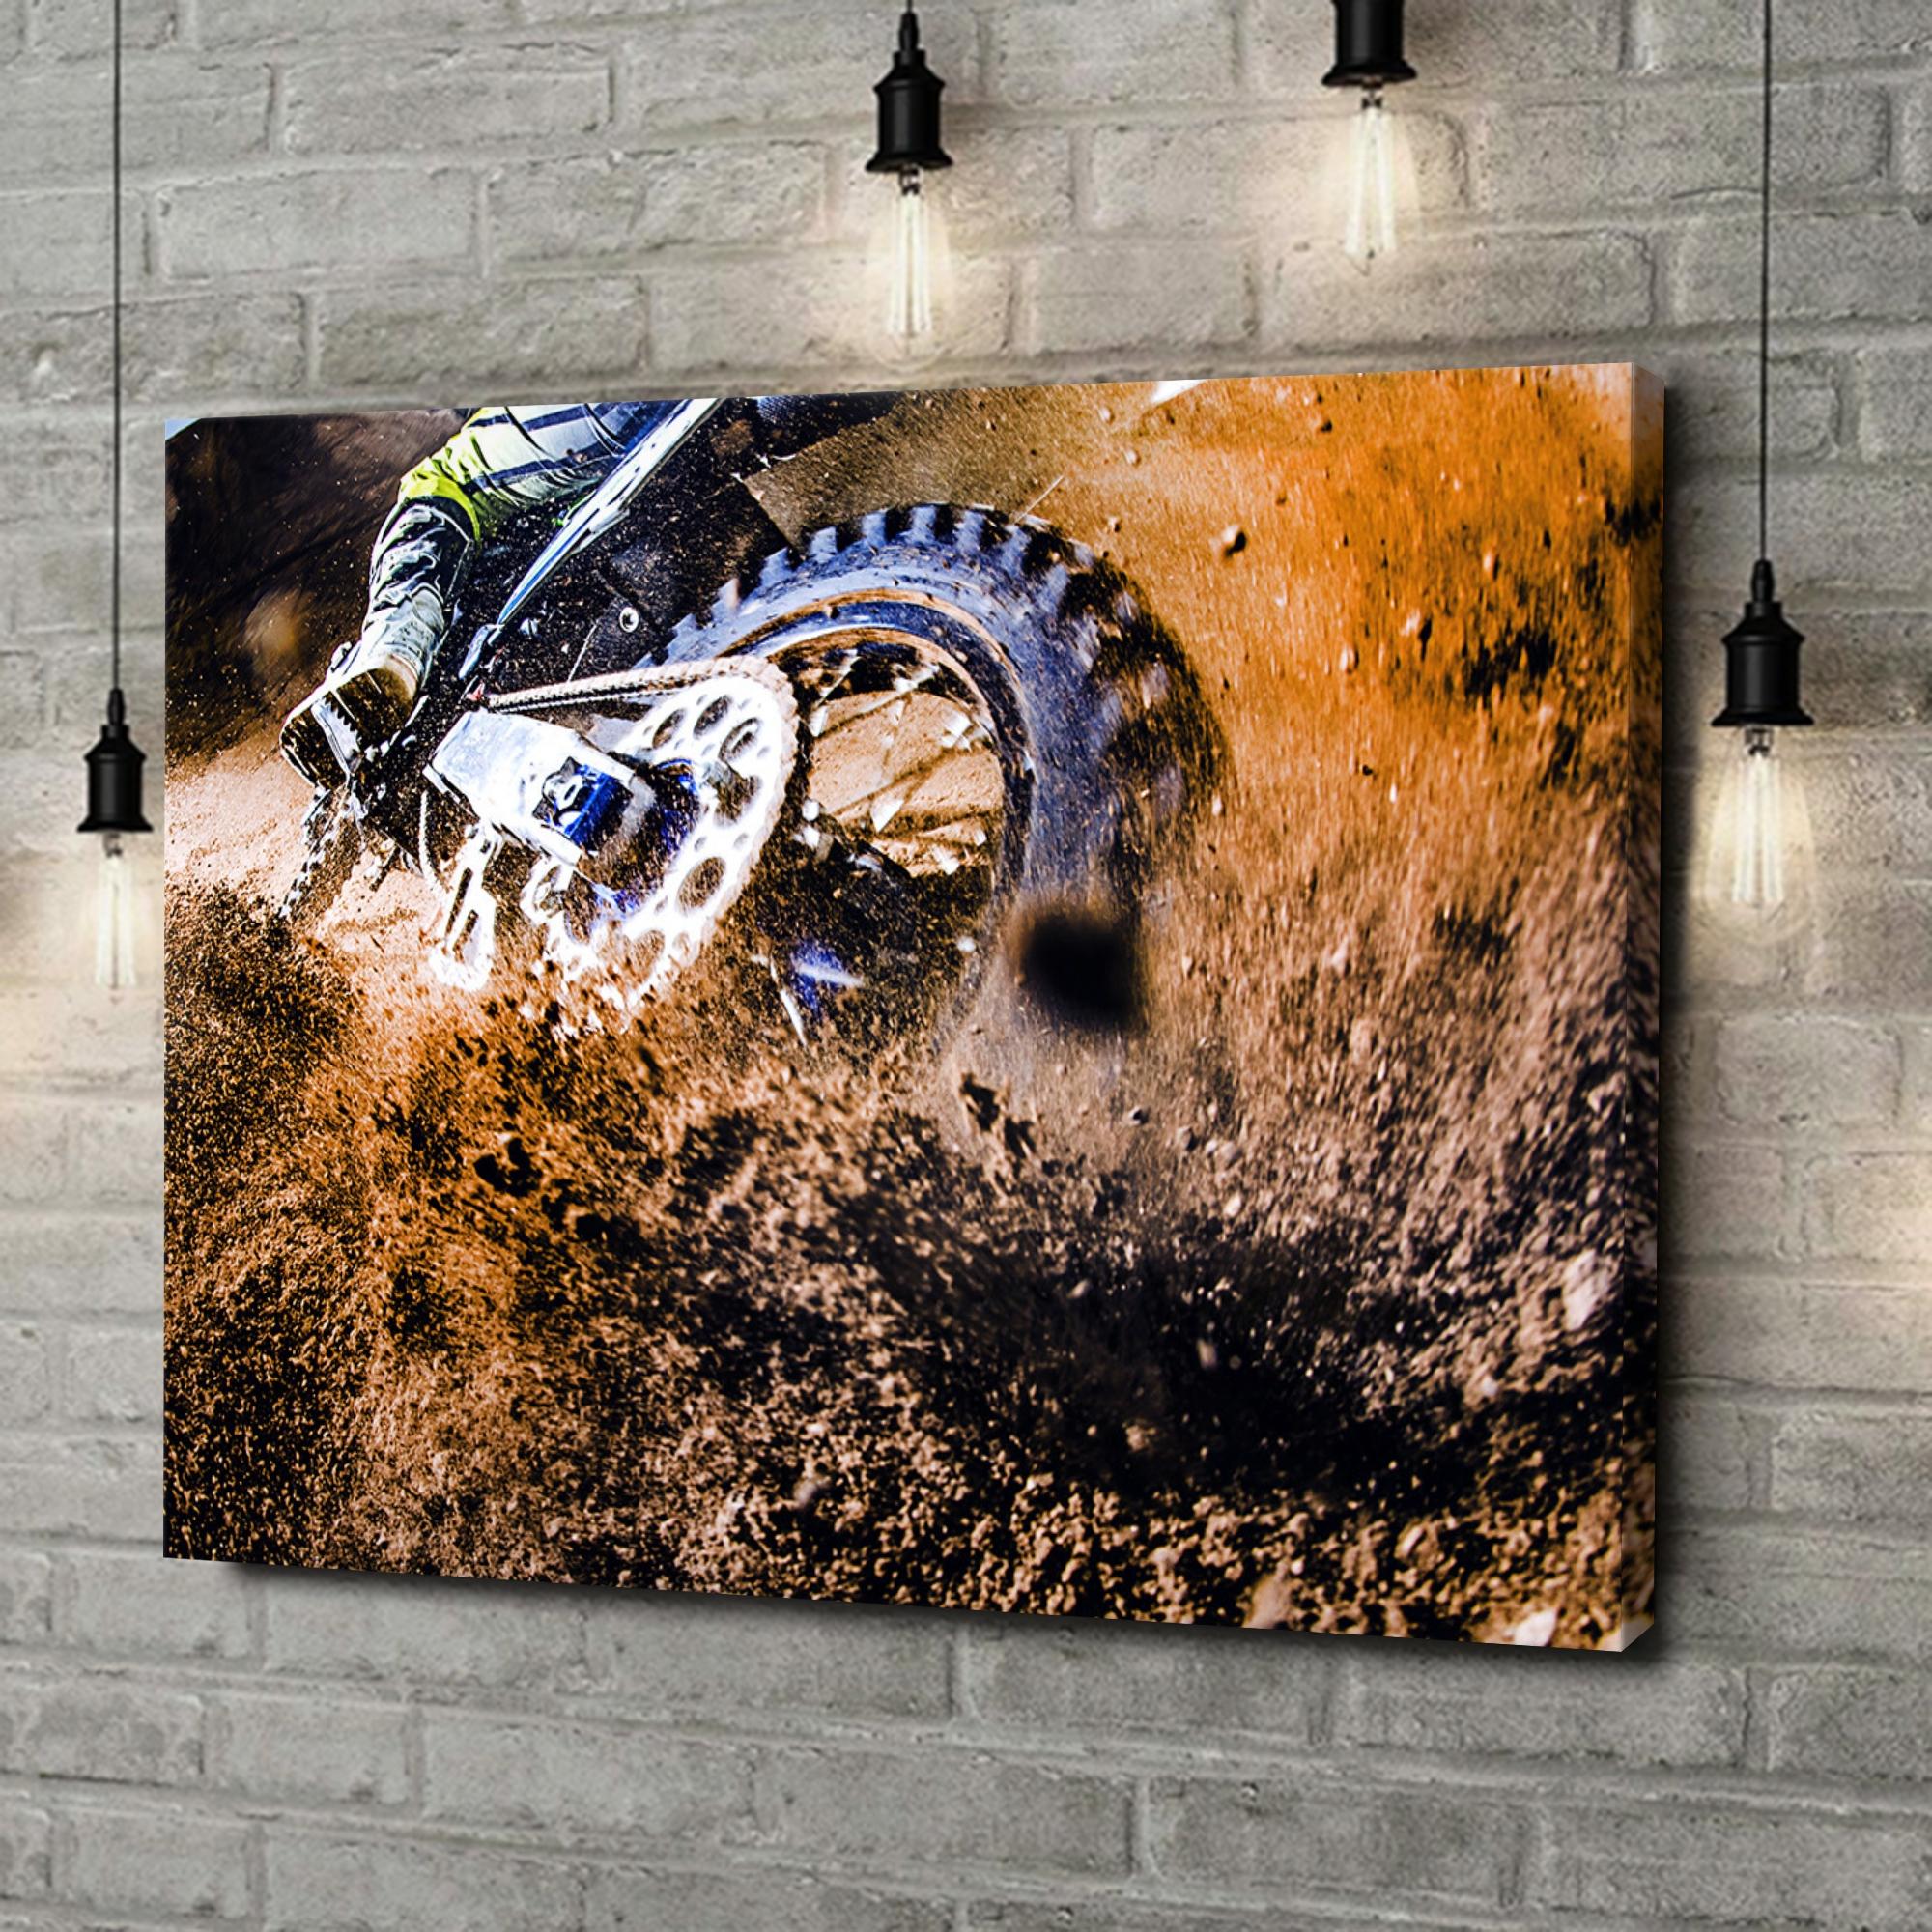 Leinwandbild personalisiert Motocross Bike